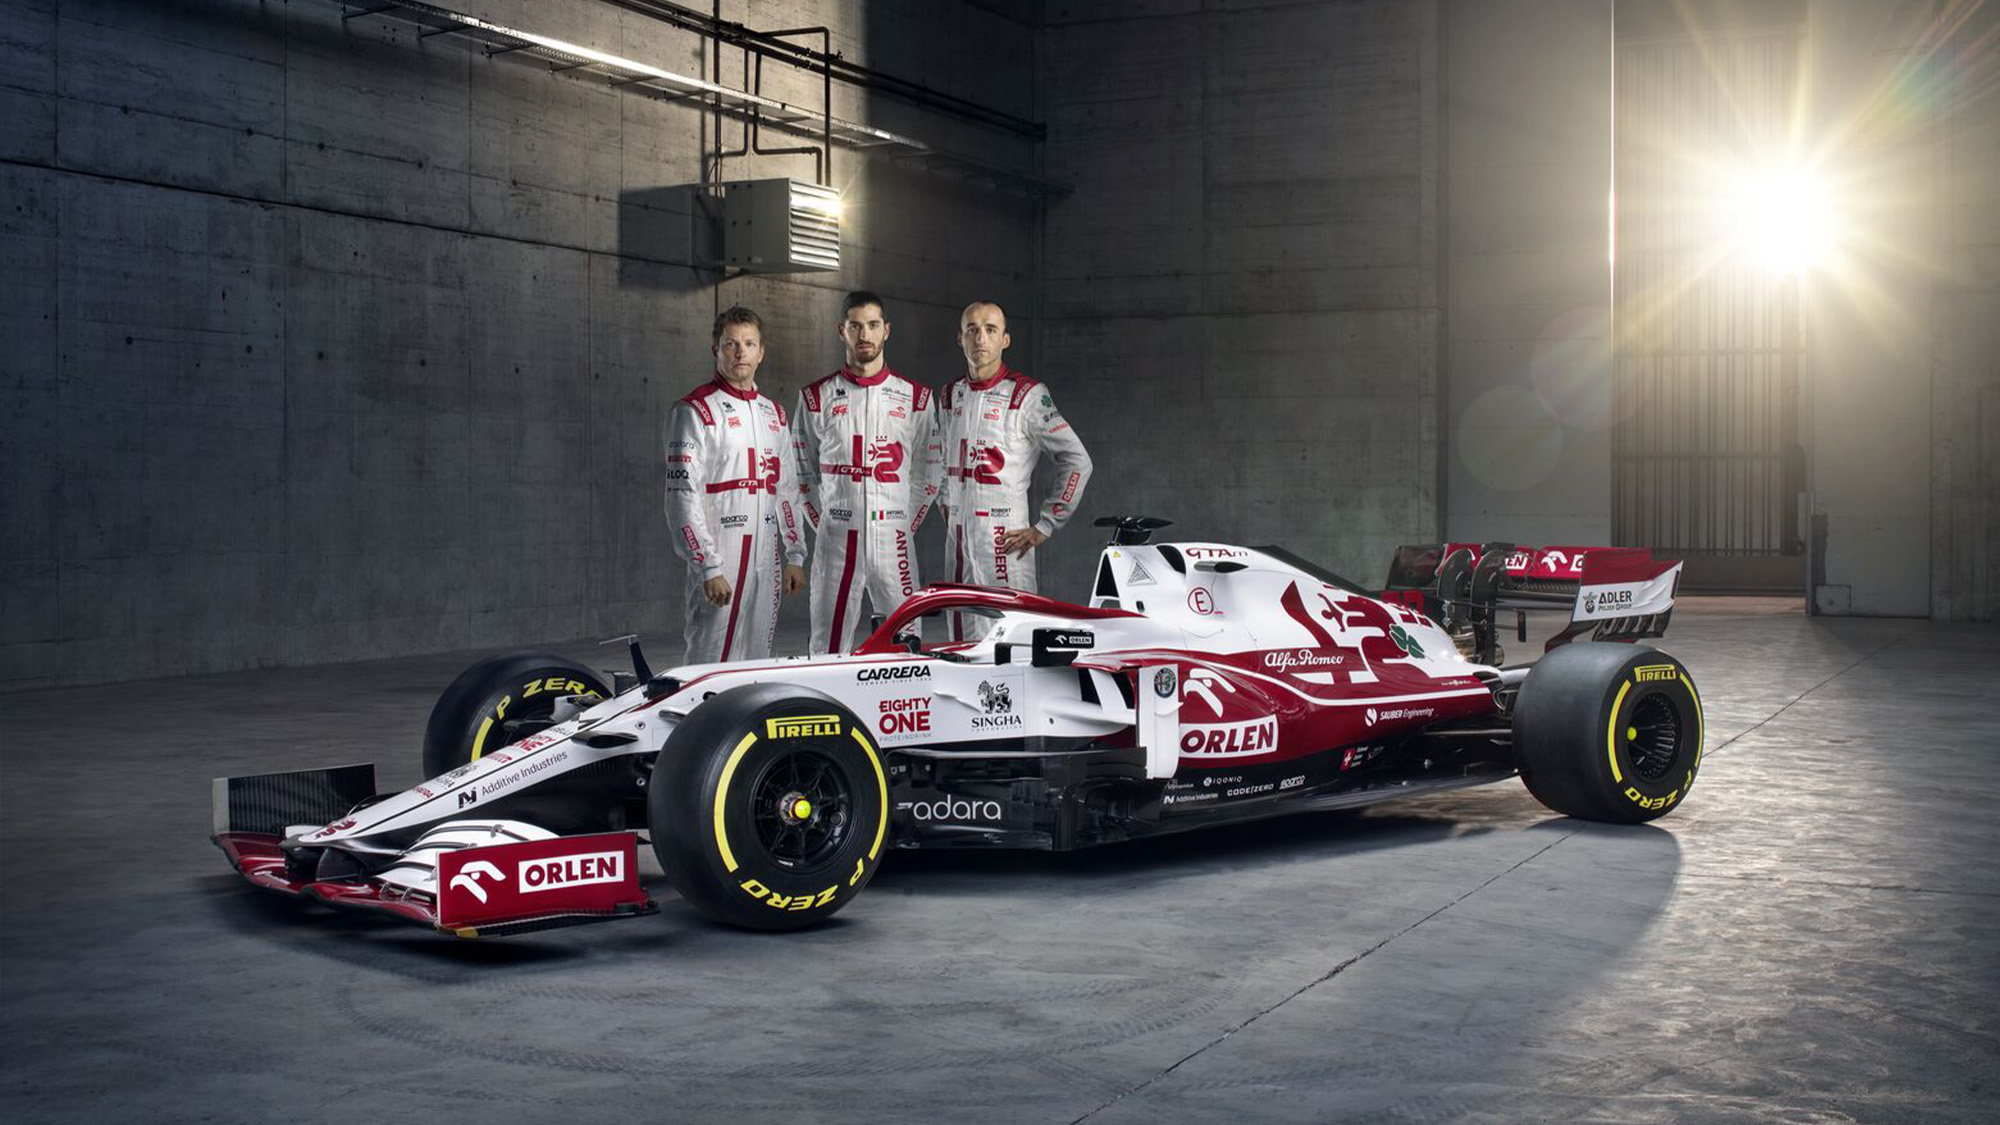 2021 Alfa Romeo team photo